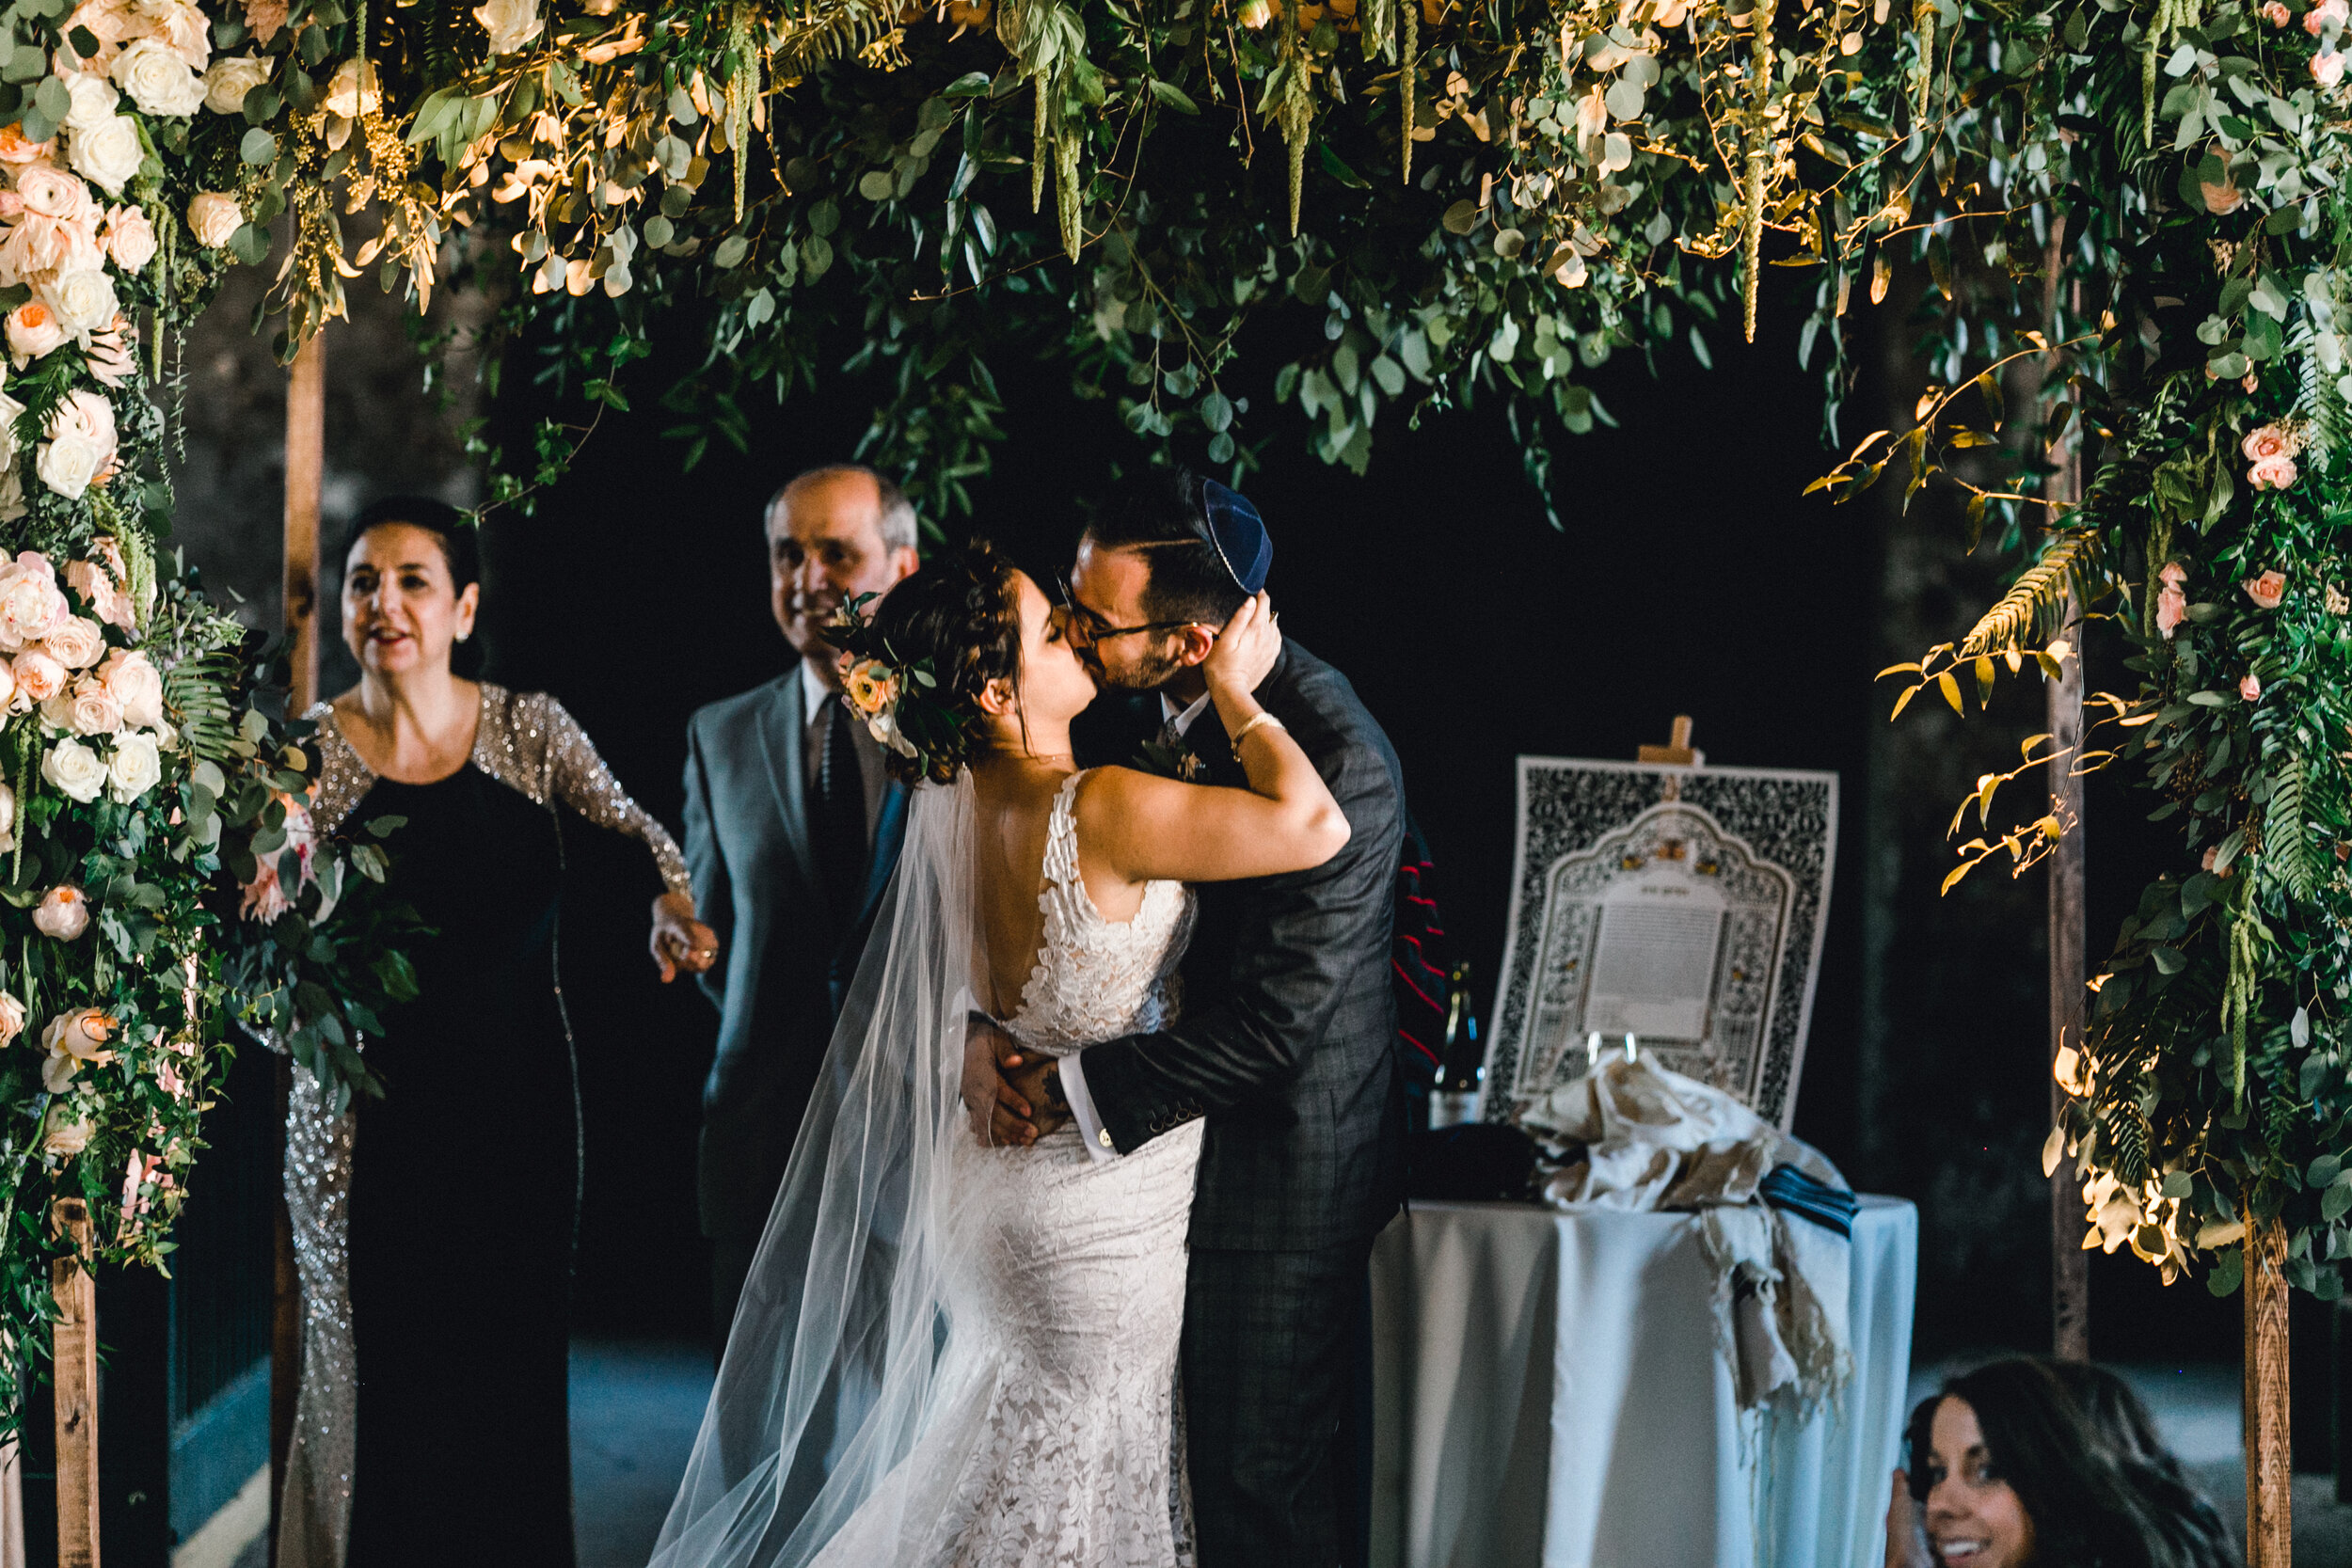 ivory-and-beau-blog-weddings-ivory-and-beau-couple-dominique-and-andres-savannah-florist-wedding-planning-savannah-bridal-boutique-wedding-flowers-KIP_WEBERWEDDING_RAILROADMUSEUM-933.JPG